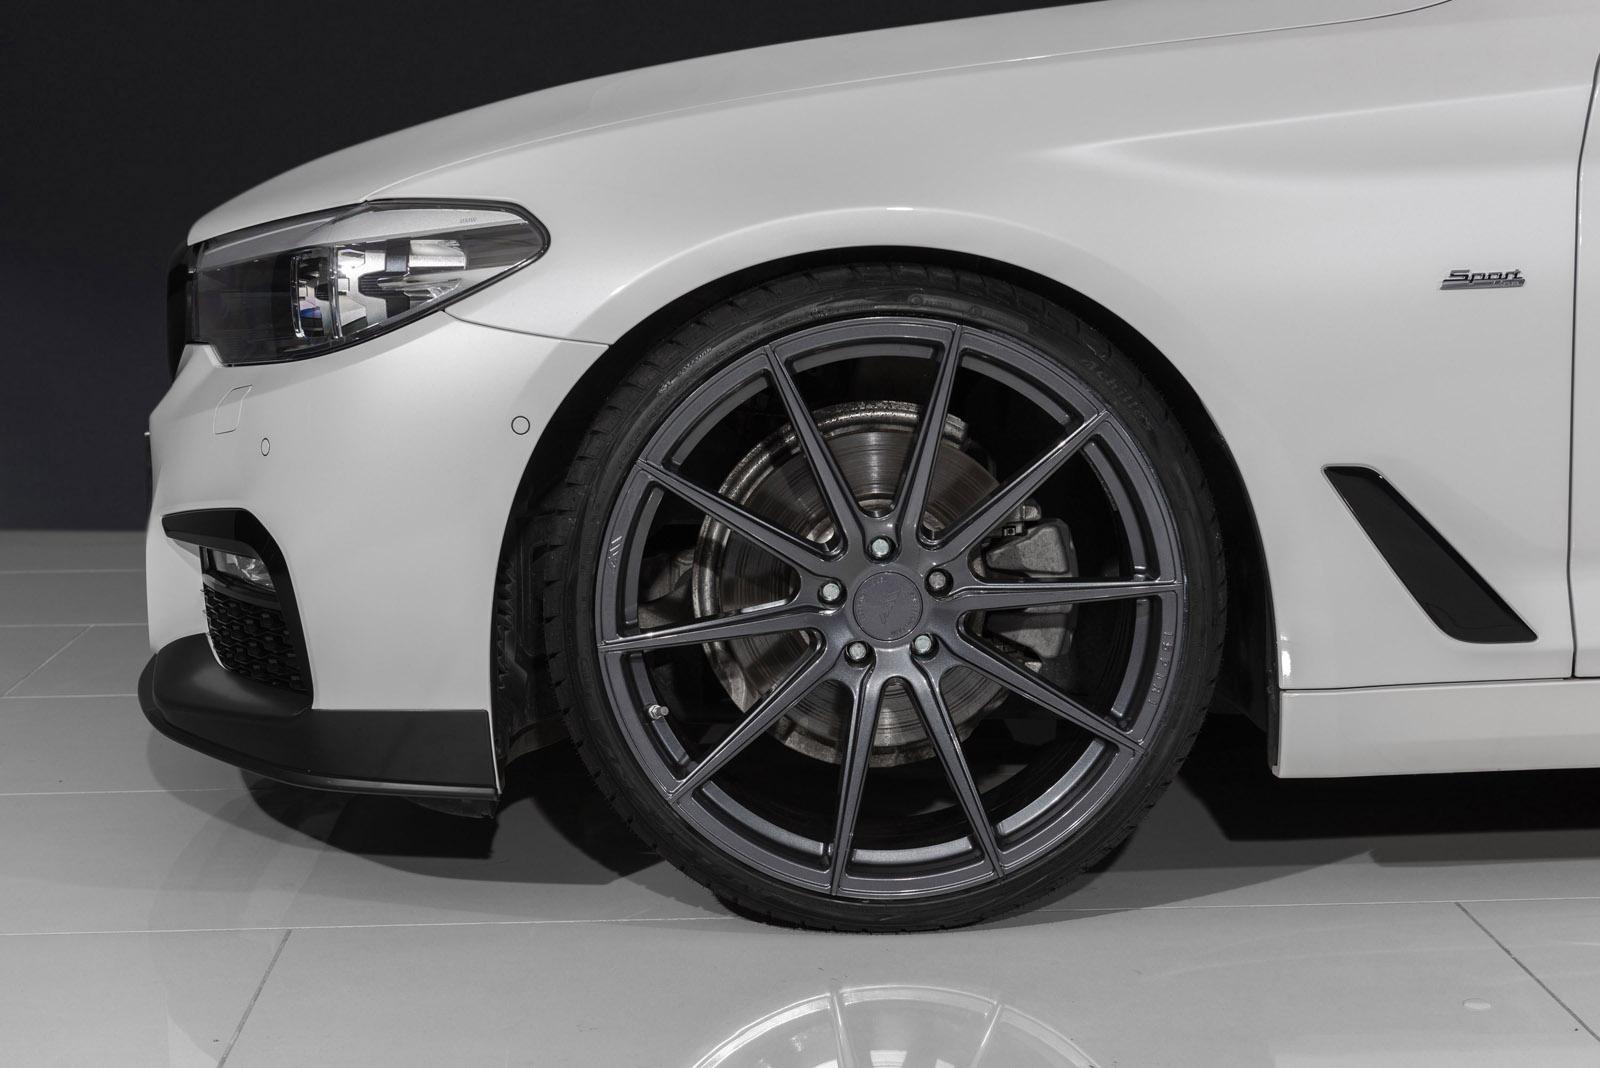 BMW_520d_7.jpg